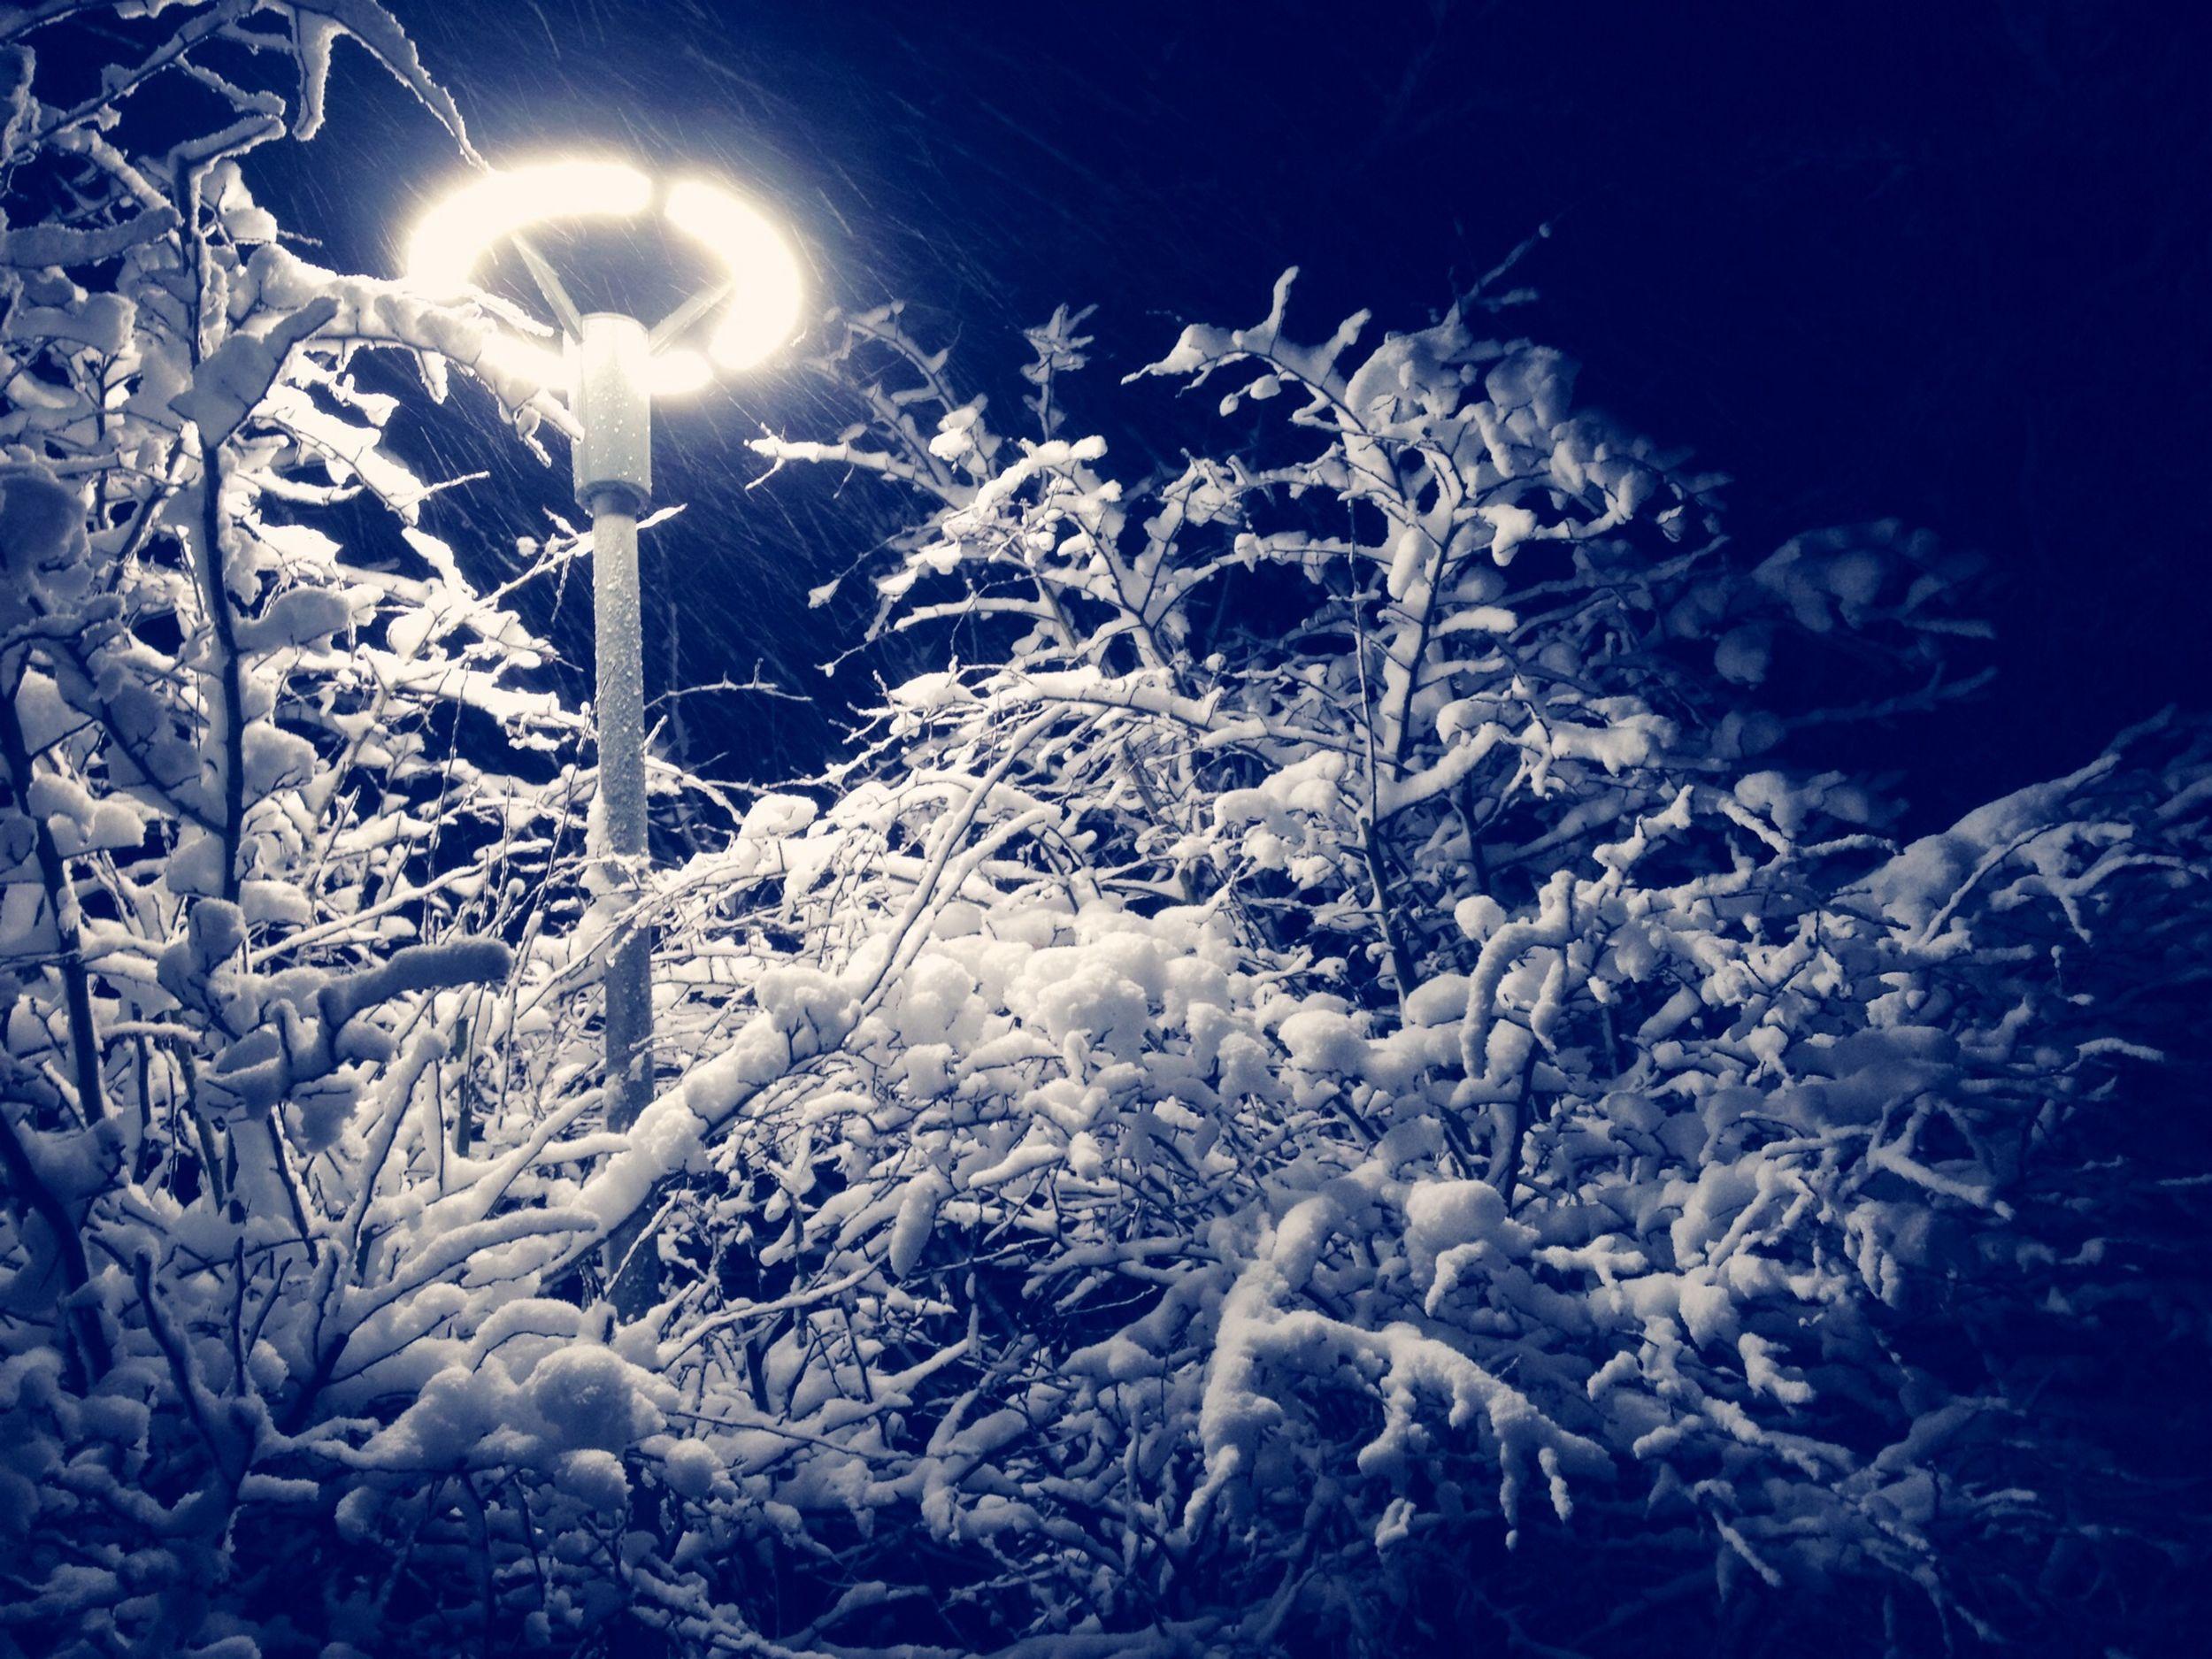 Sneén ved det smukke lys, og grene